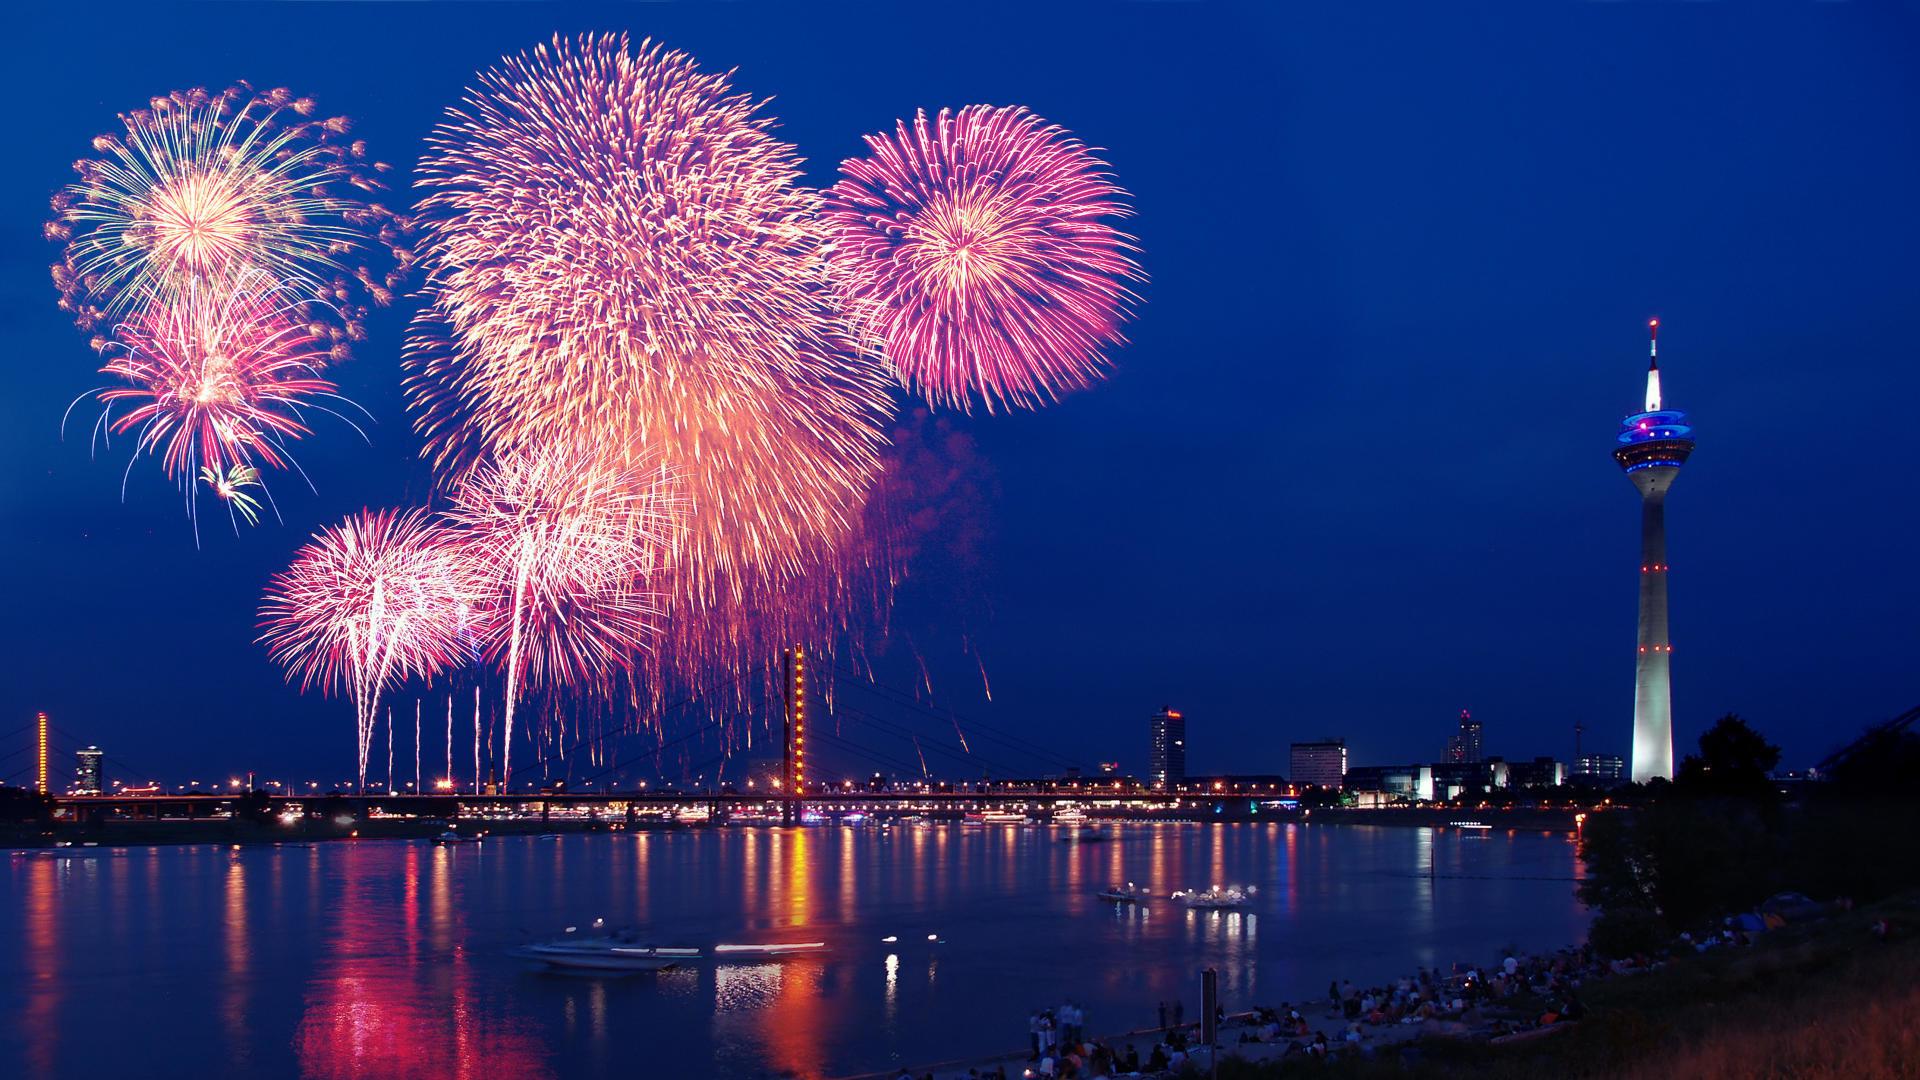 High Resolution Fireworks Full Hd 1080p Wallpaper ID384307 For Desktop